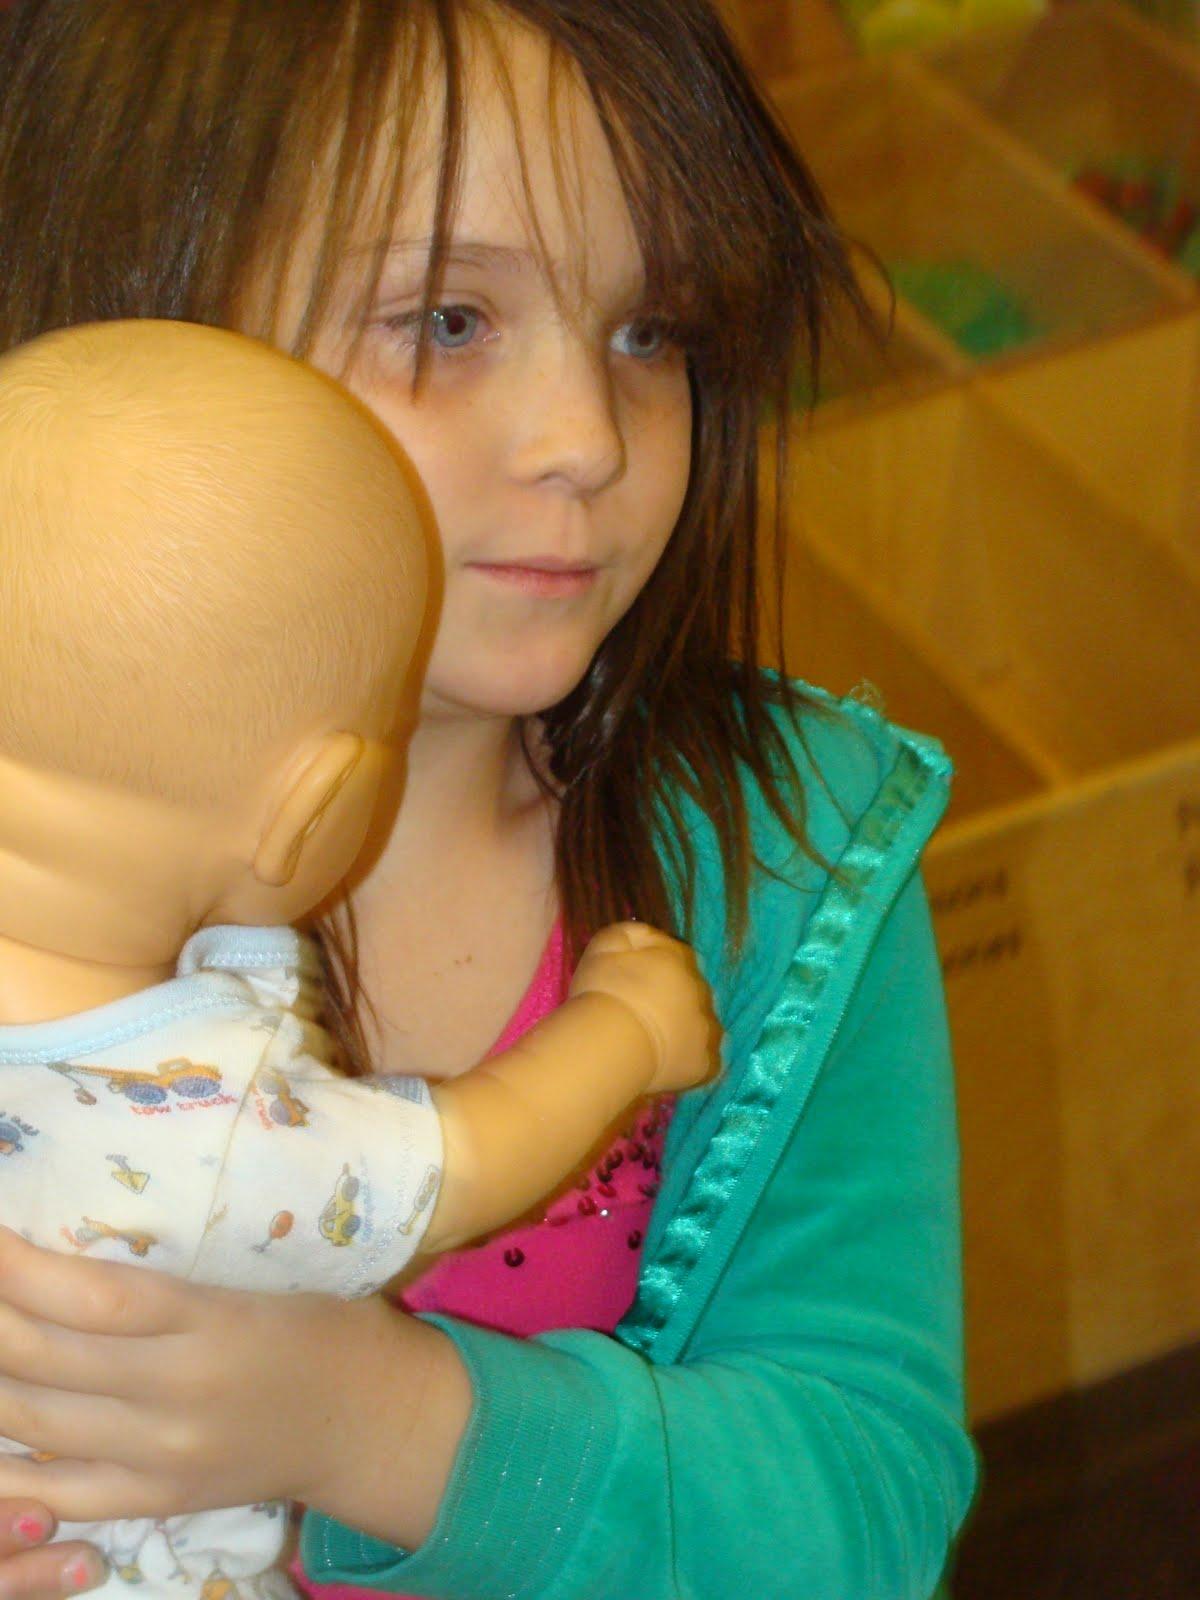 Anatomy correct dolls